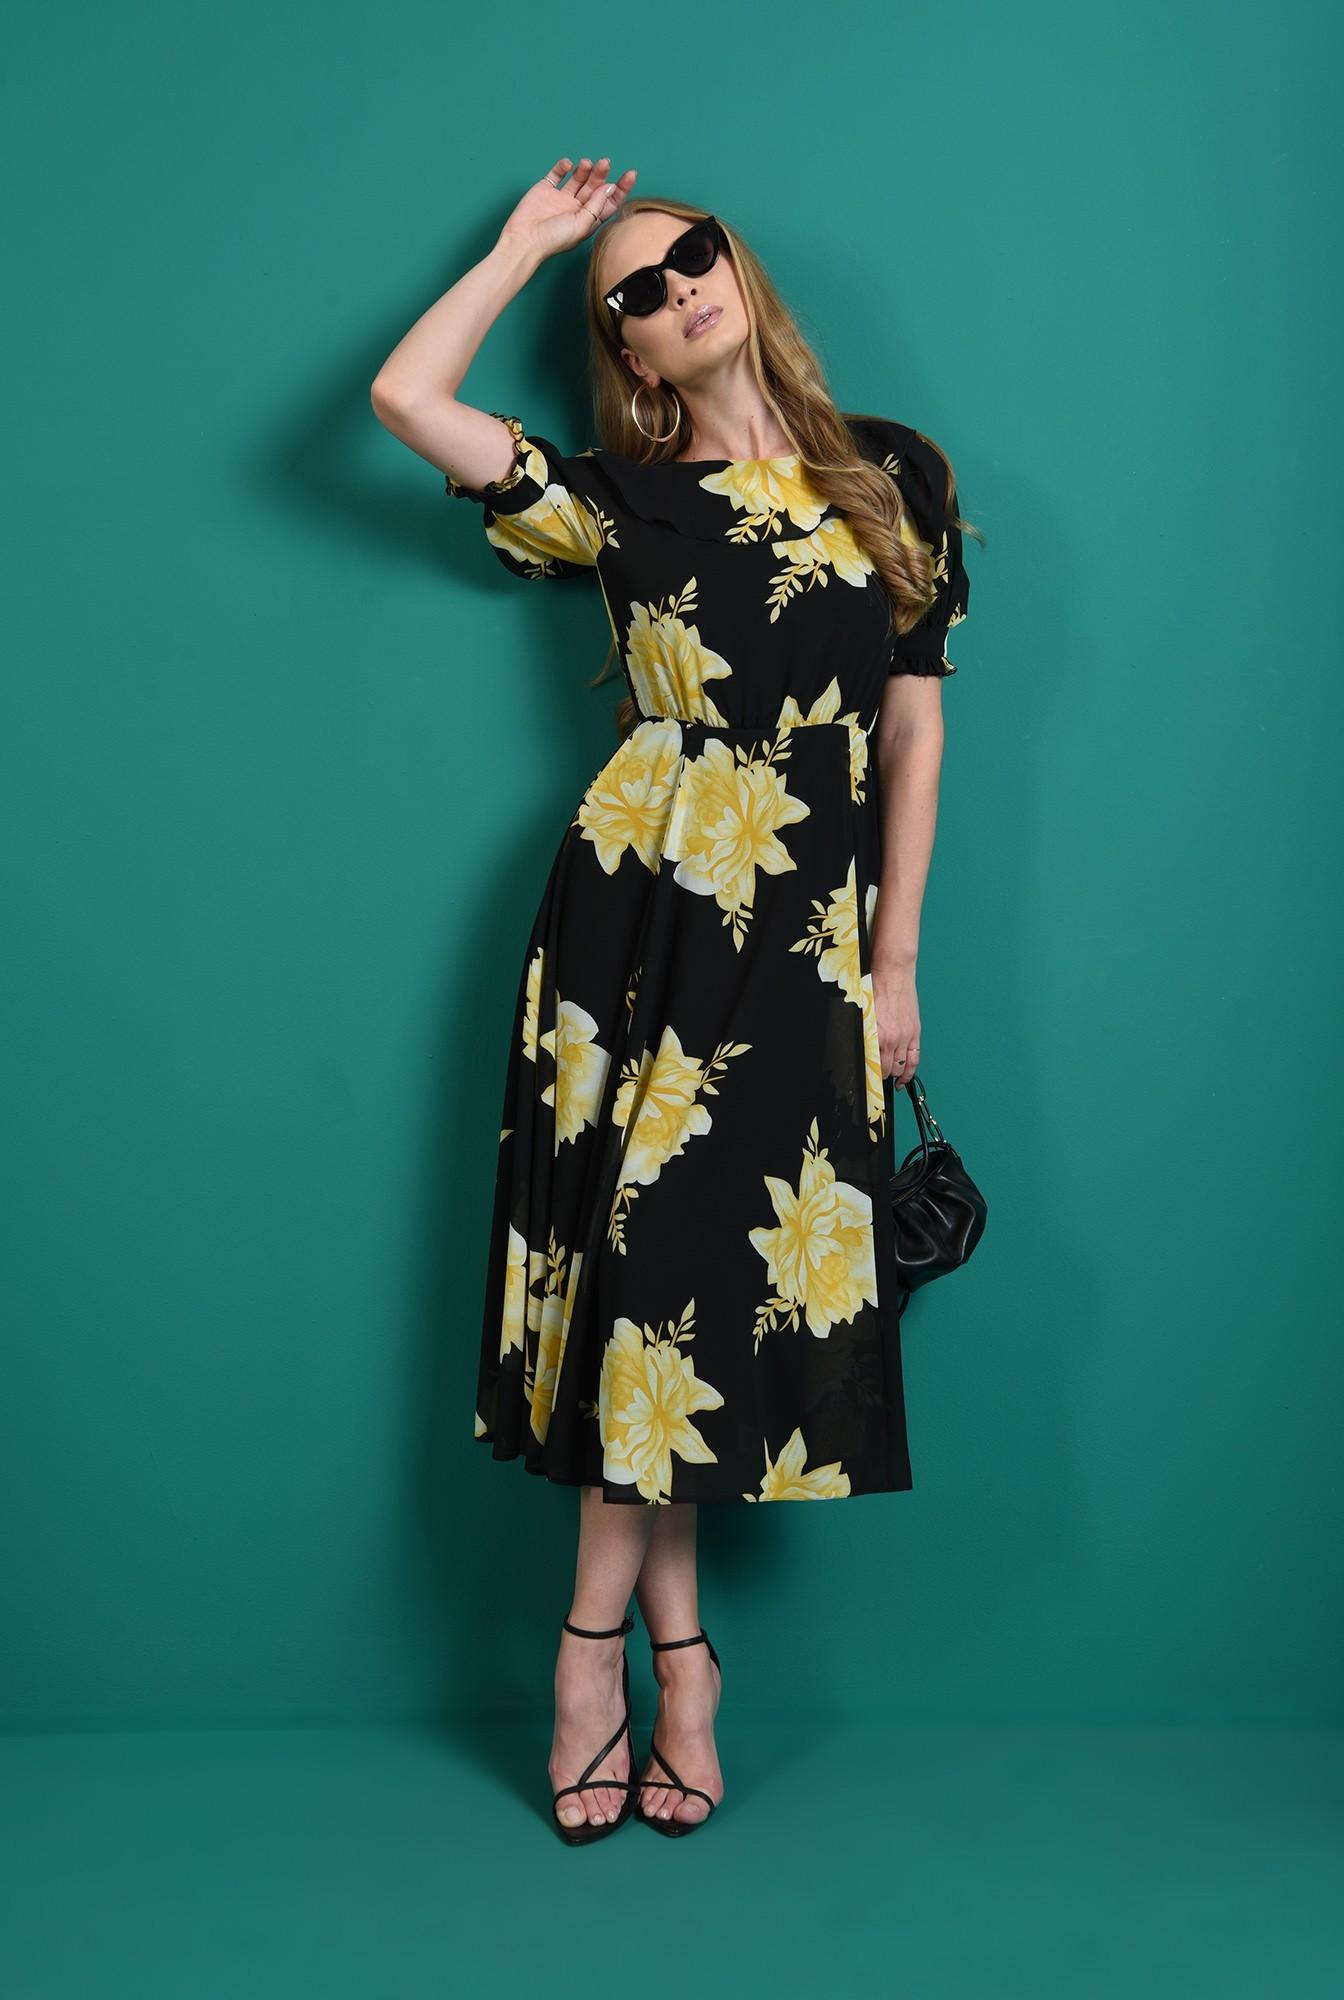 0 - rochie cu motive florale, evazata, Poema